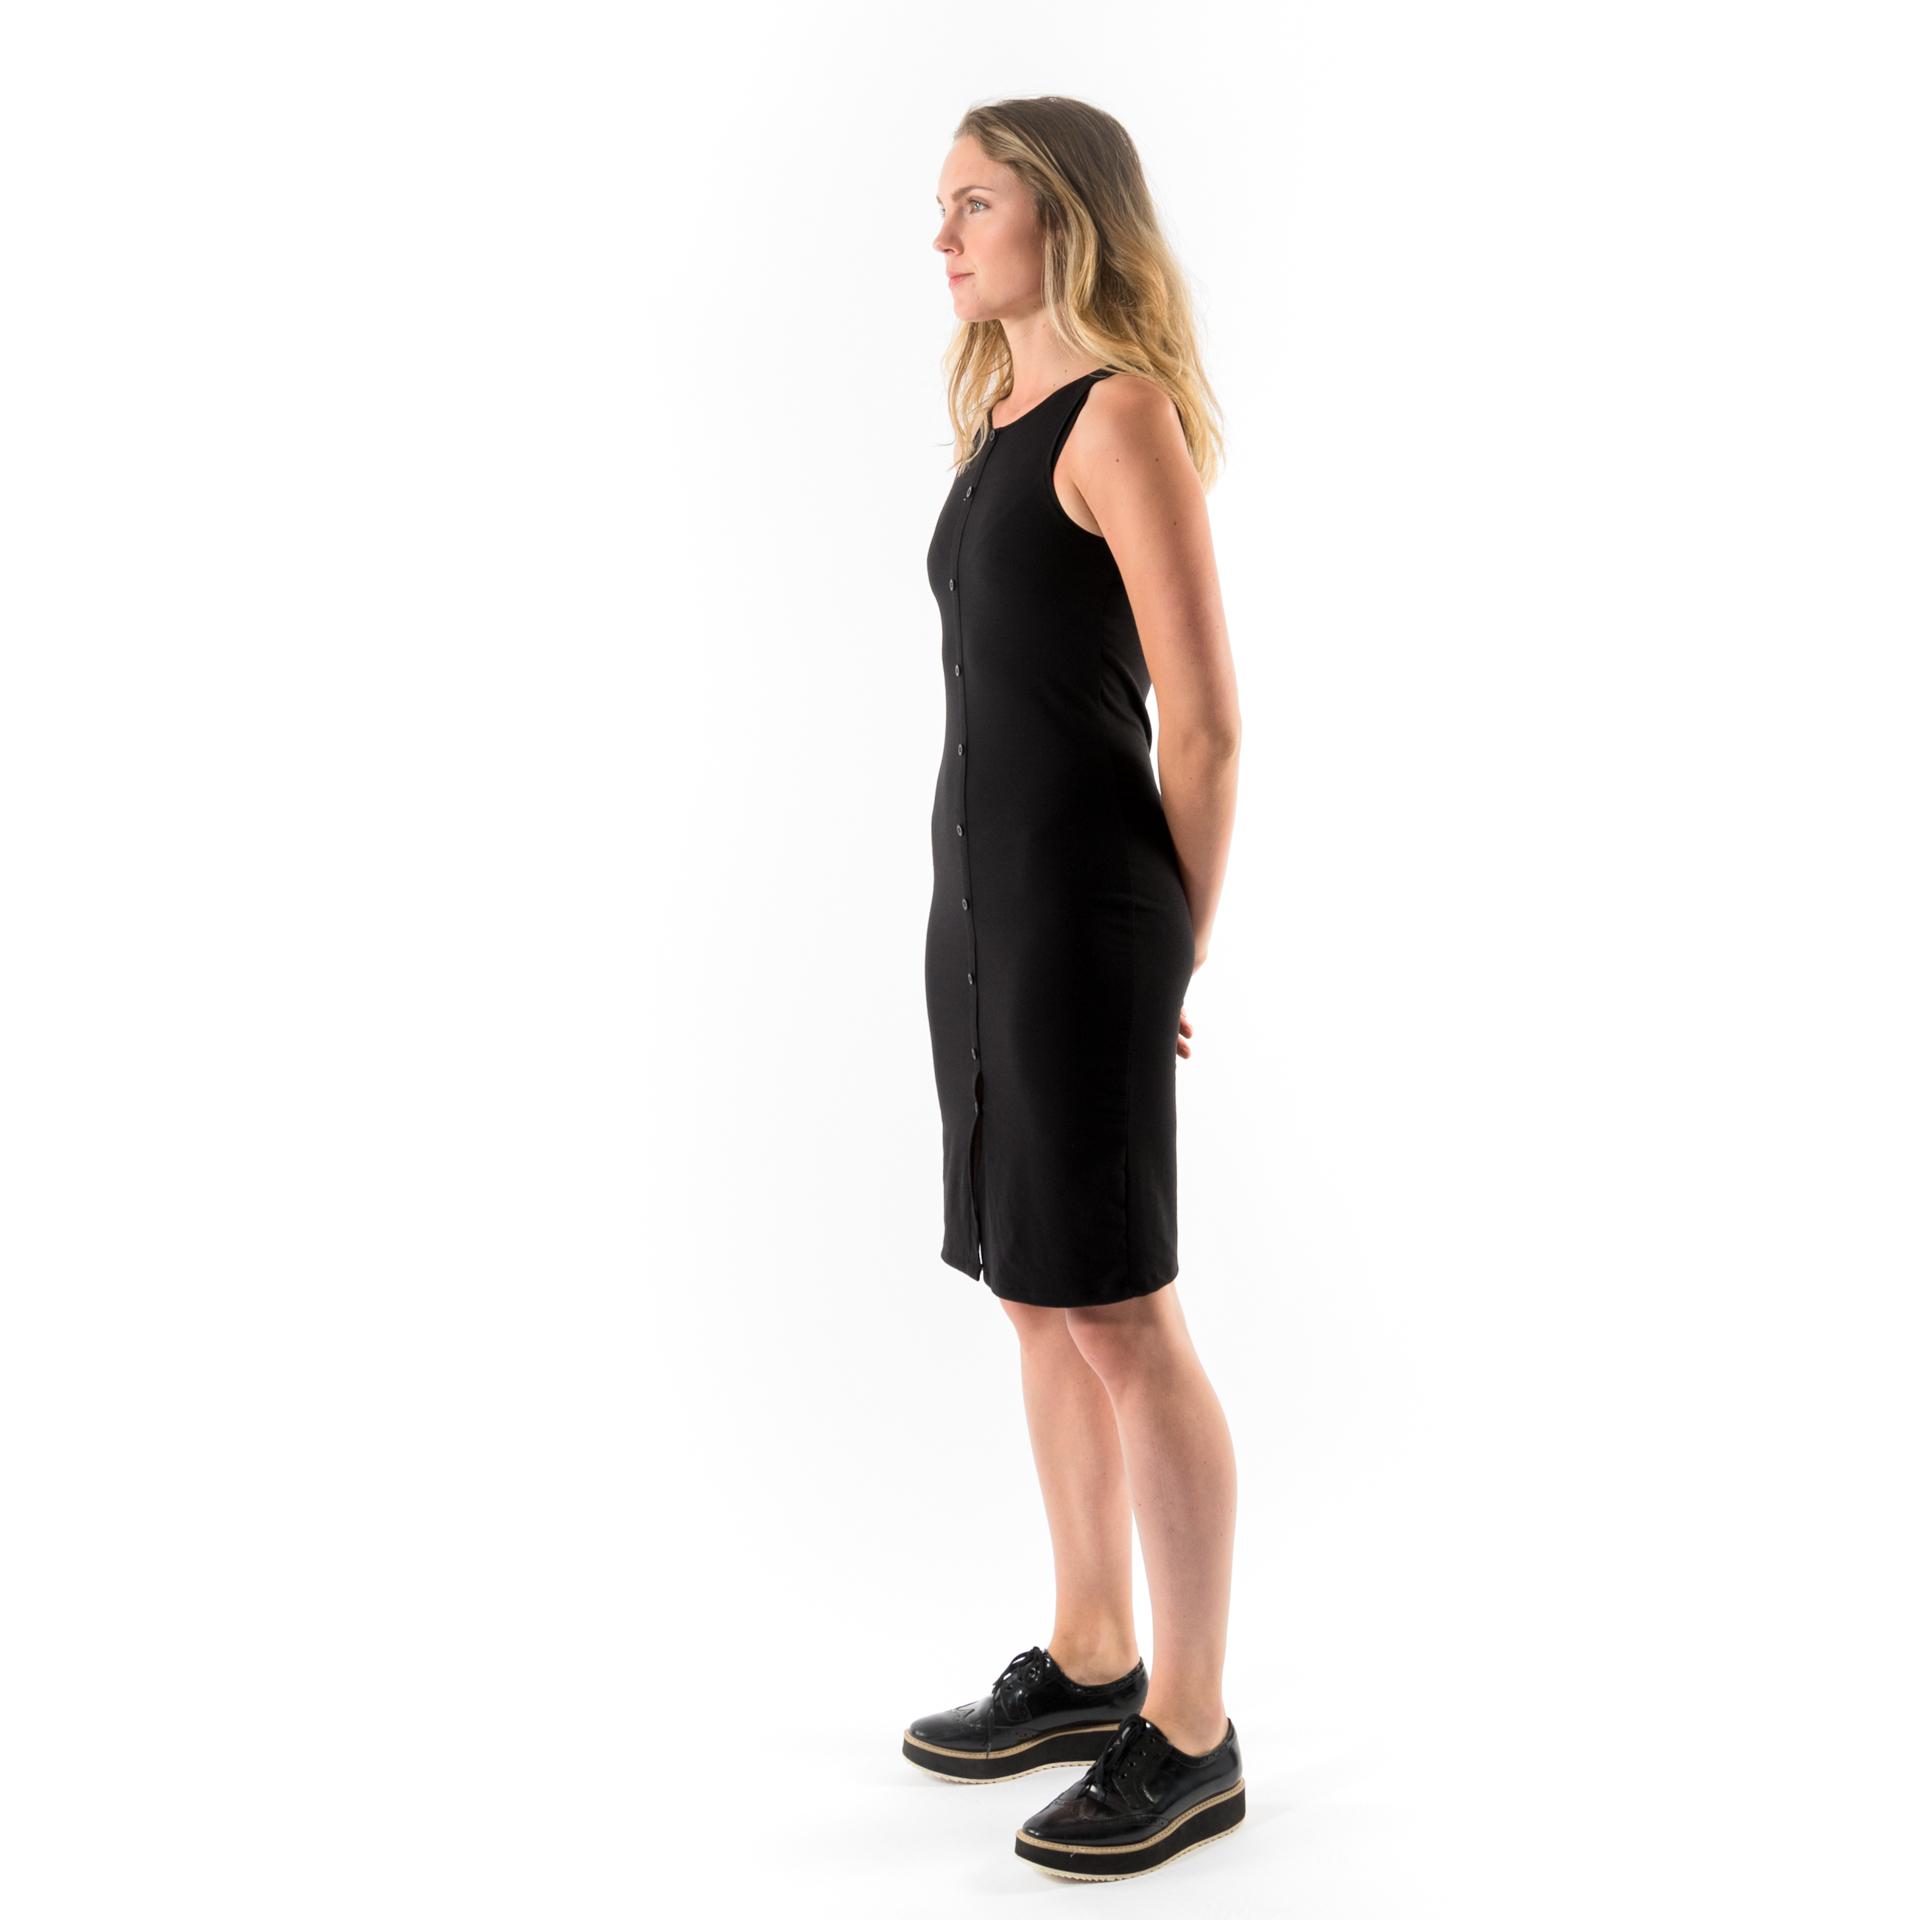 Kim Sassen Clothing Anna Dress Black Front Side